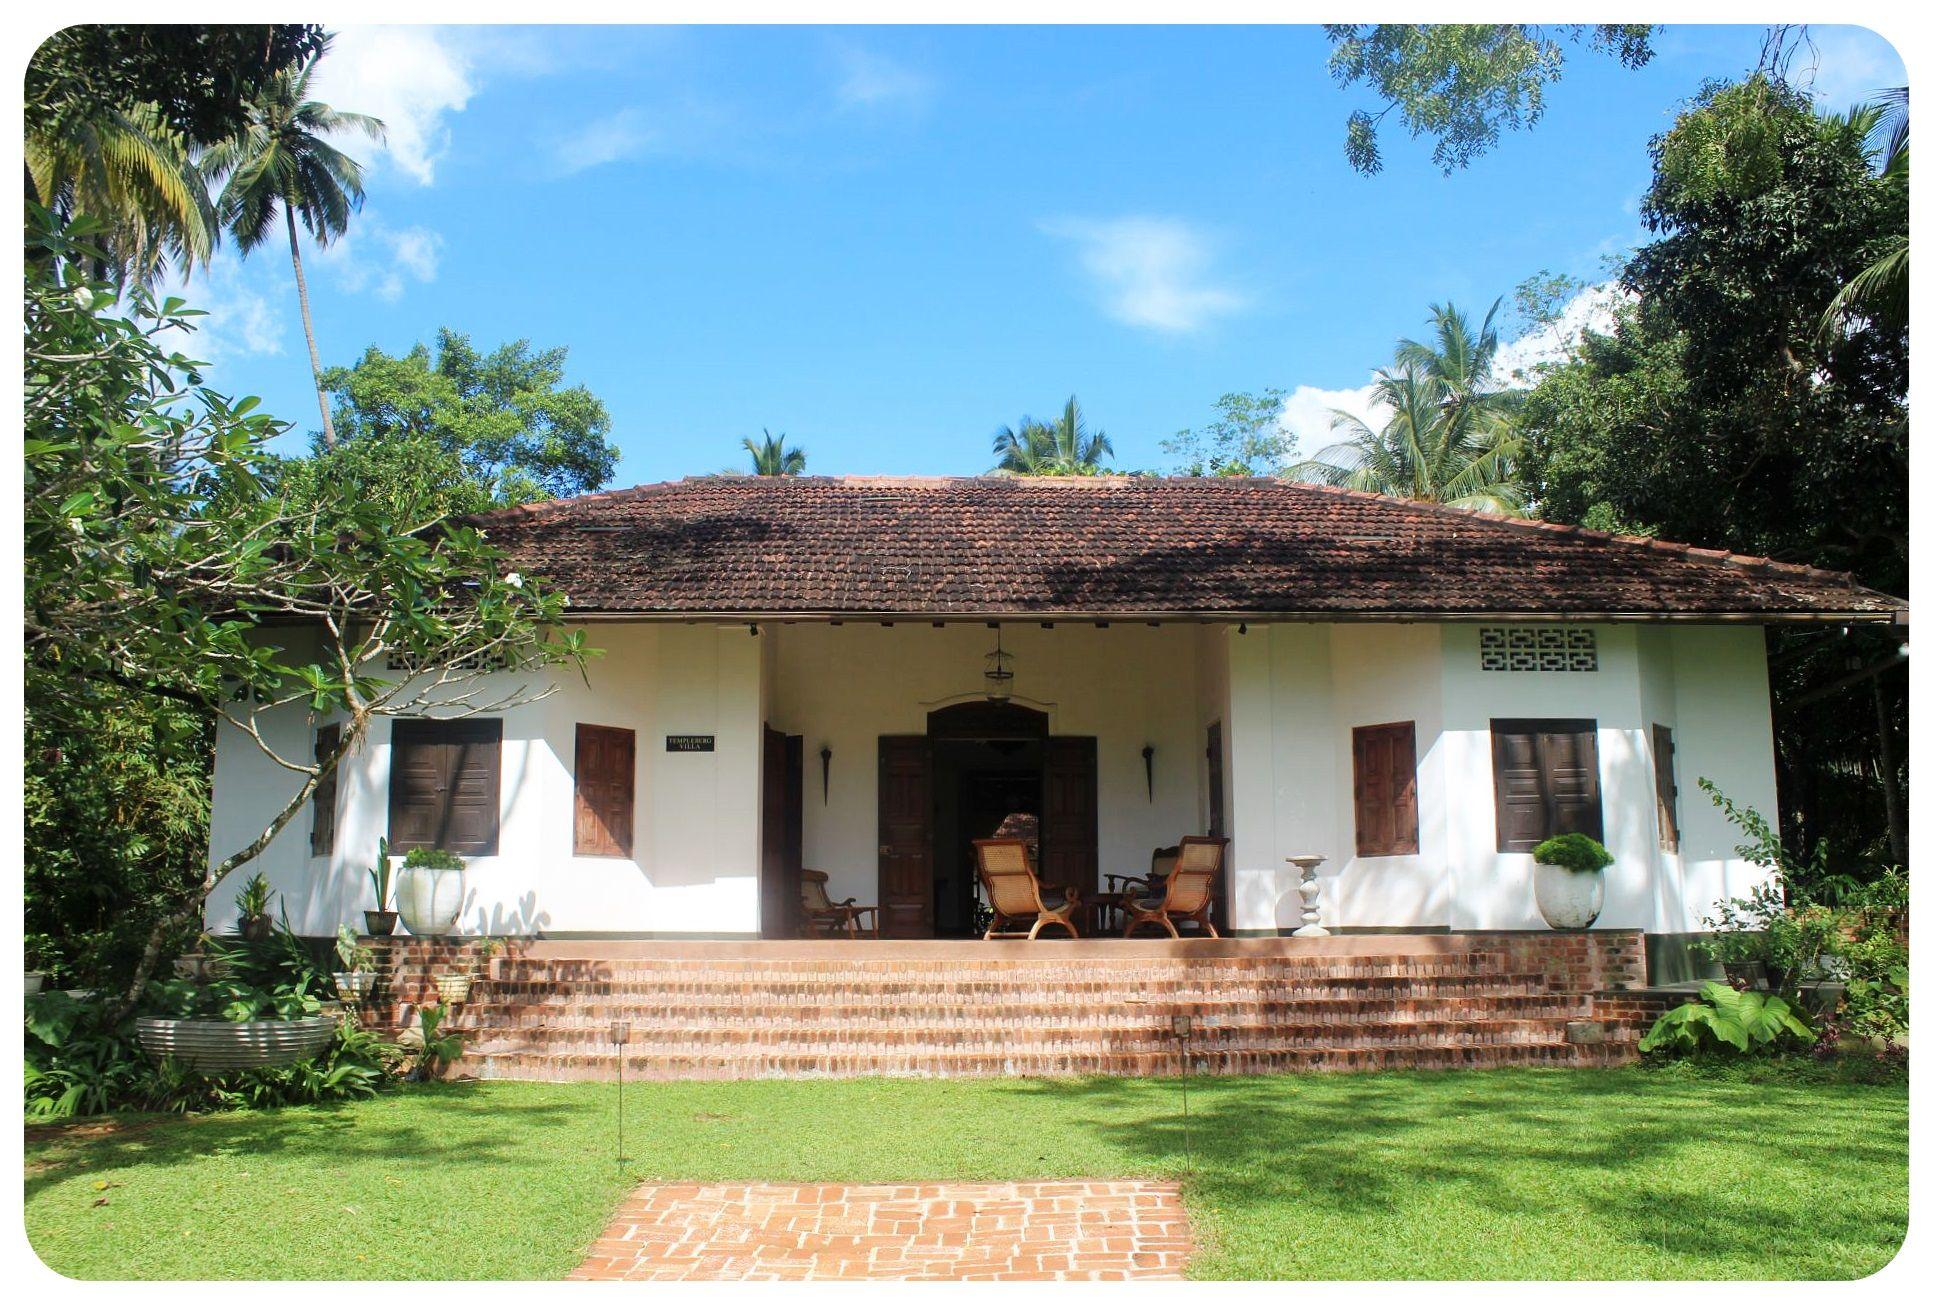 Templeberg Villa And Bungalow Galle Beach Sri Lanka 1933 1305